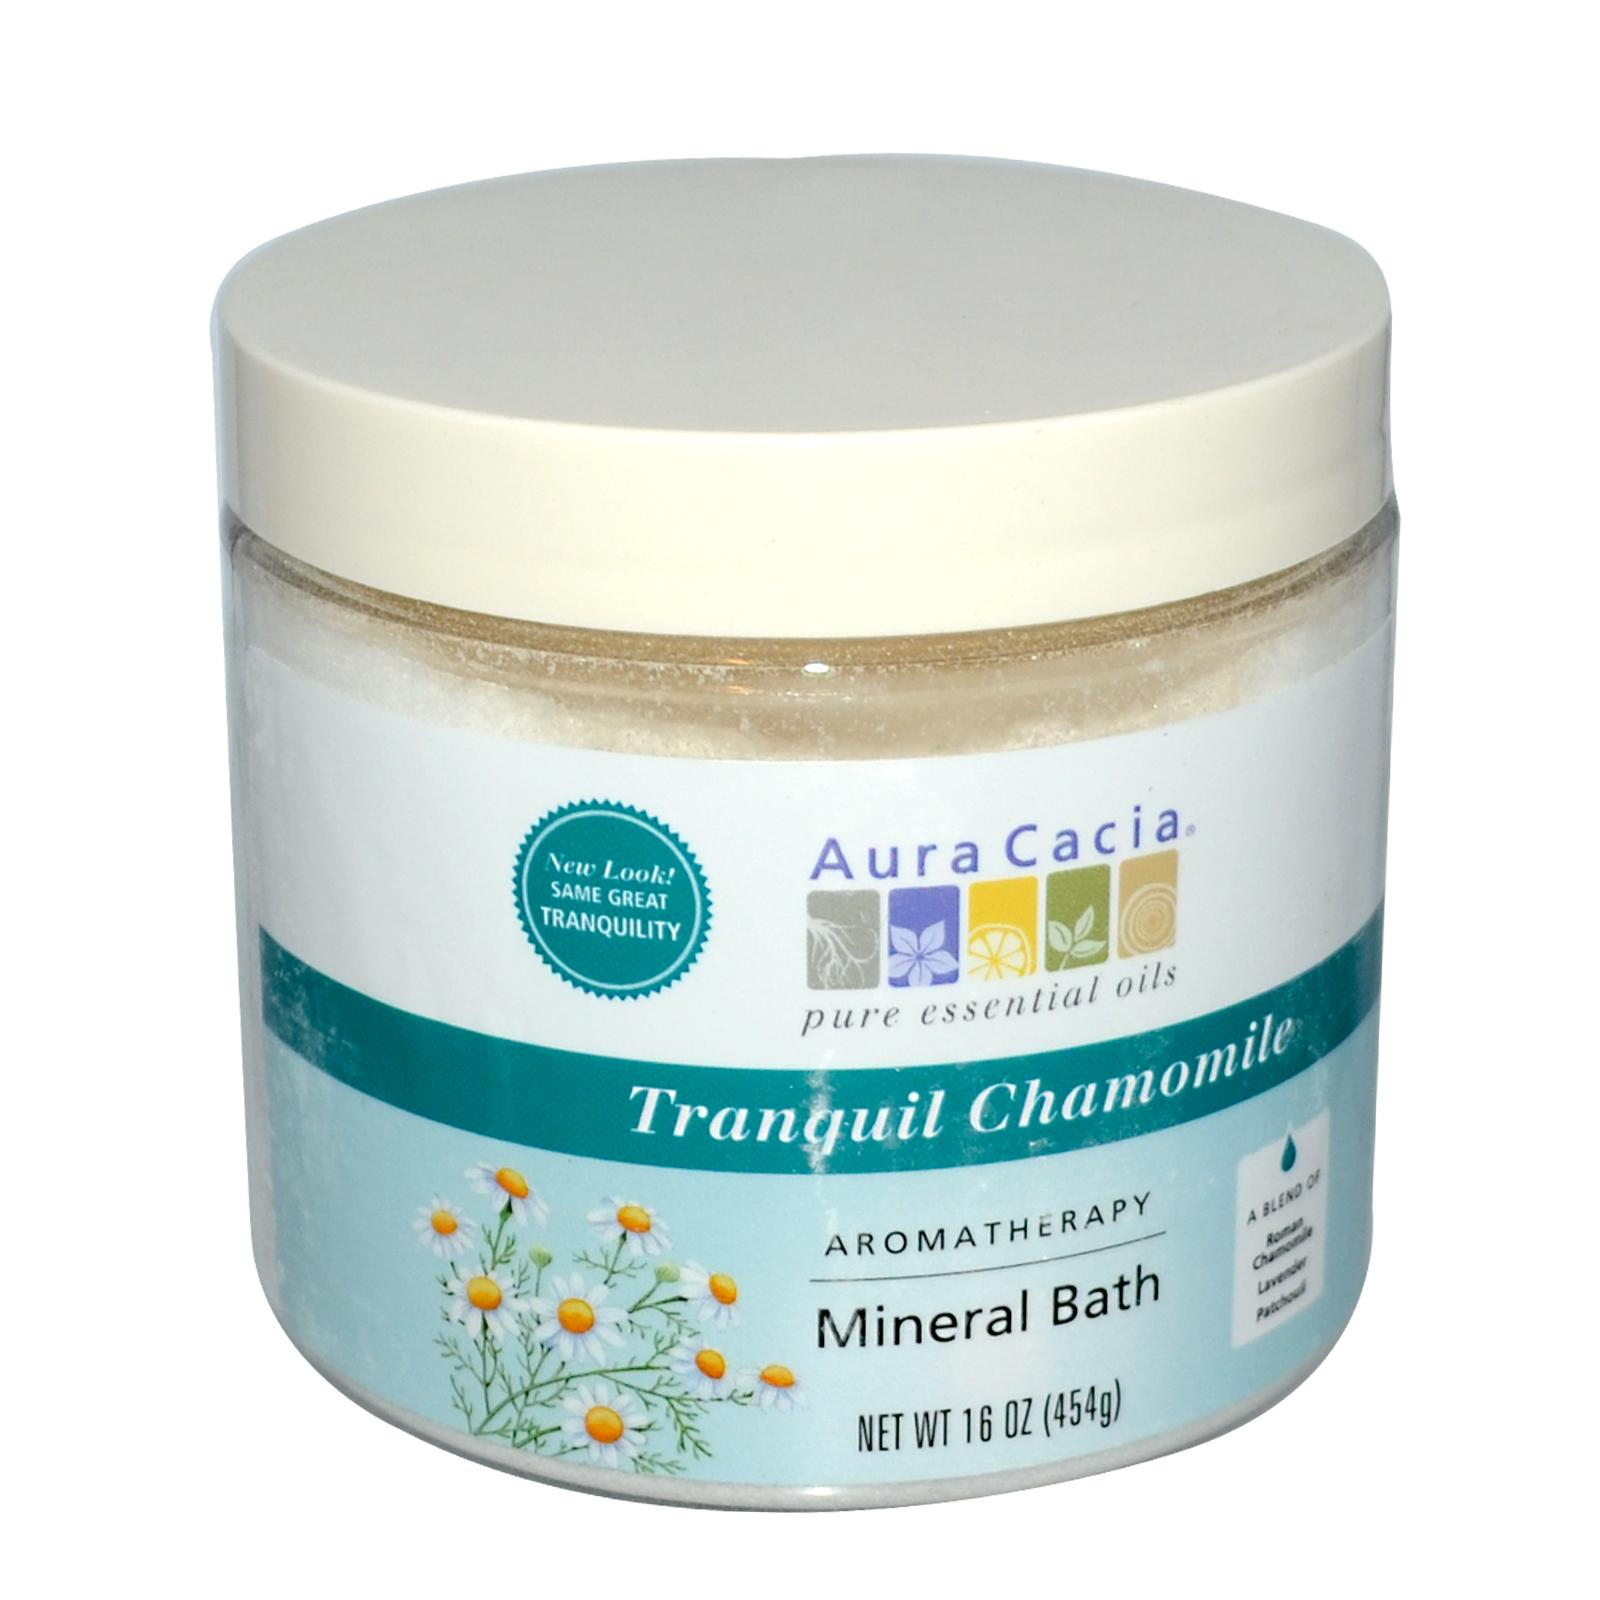 Aura Cacia Tranquility Mineral Bath Chamomile (1x16 Oz)